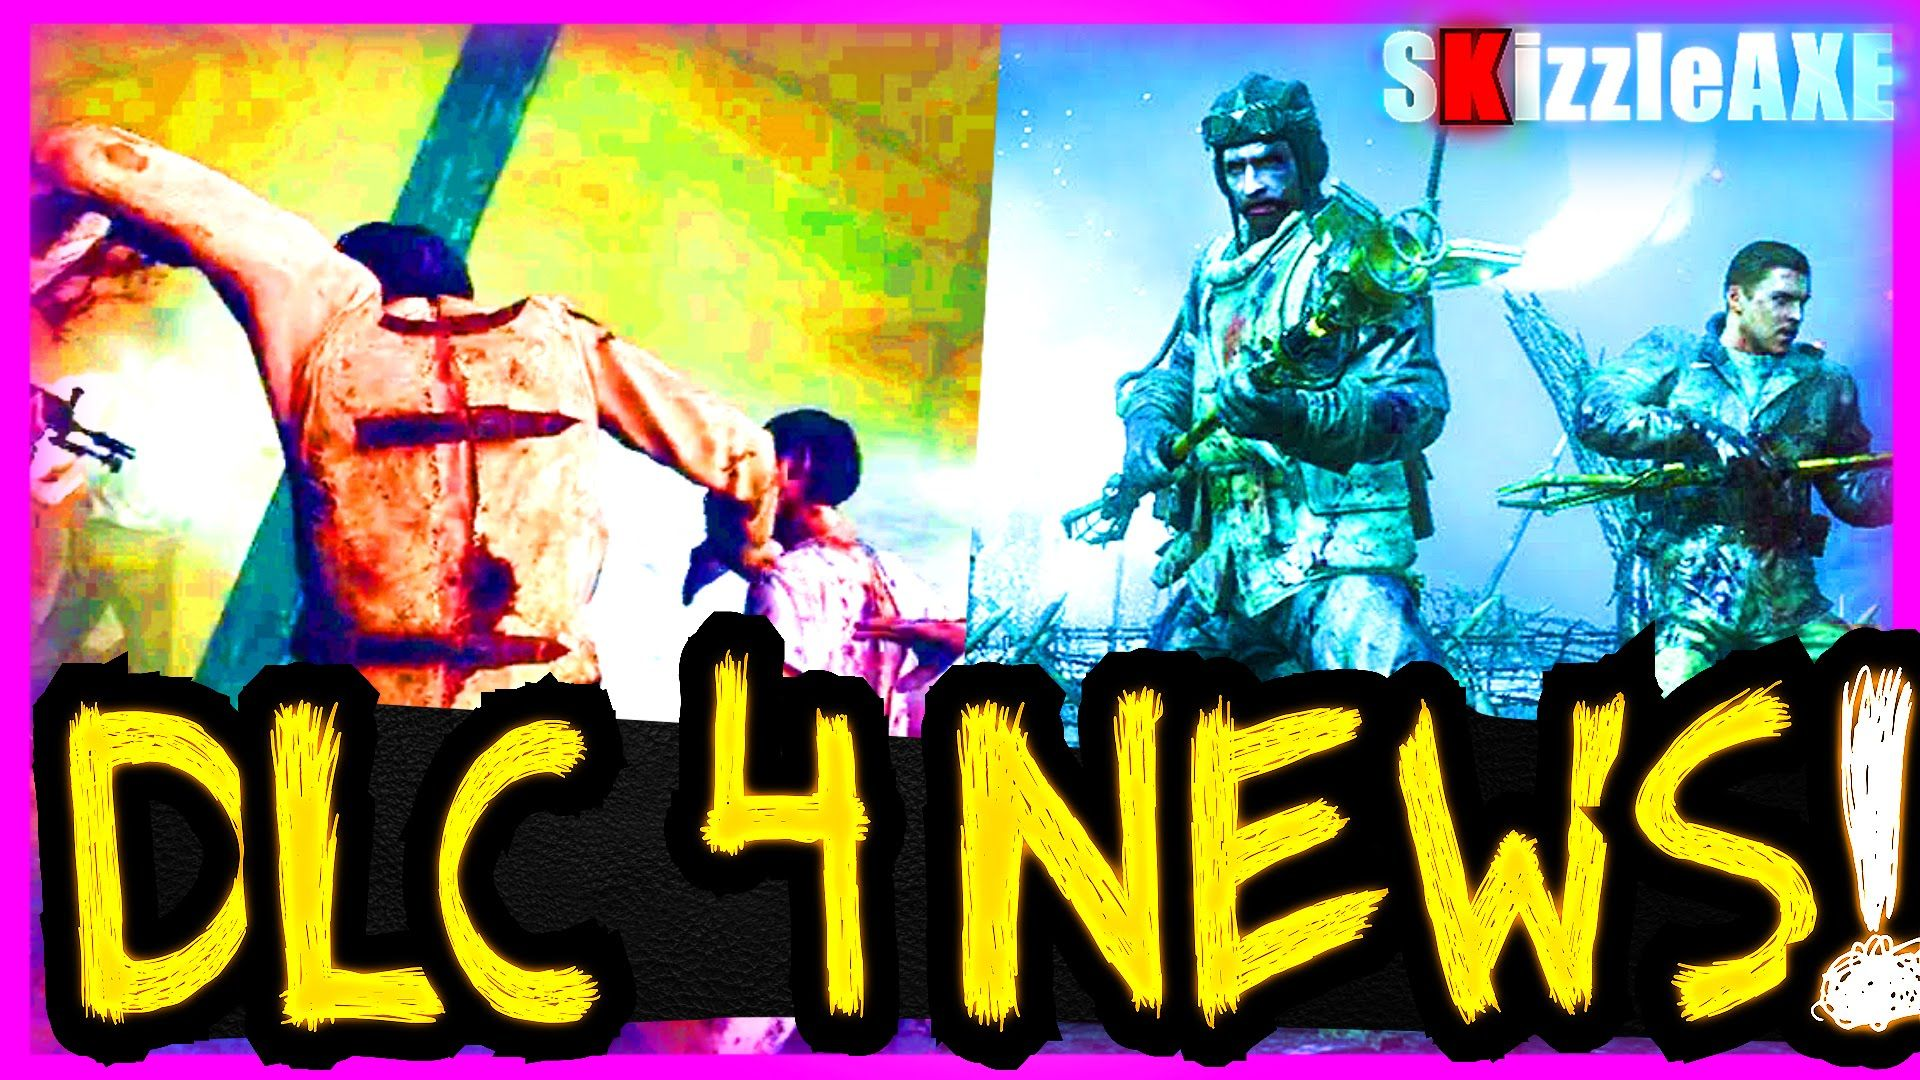 Dlc 4 Remaster Maps Coding Found In Black Ops 3 Zombies Origins Kino Remake Bo3 Dlc 4 Revelations Black Ops 3 Zombies Black Ops 3 Black Ops